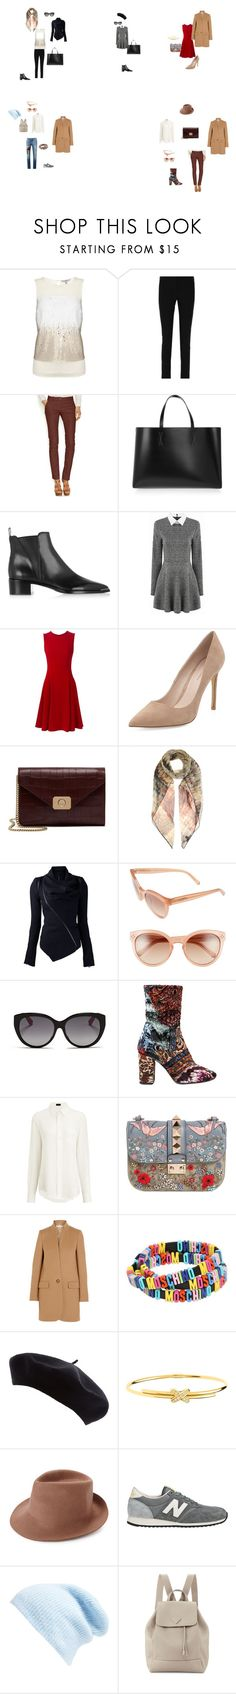 """Nat_looks"" by lesskoff on Polyvore featuring мода, Coast, STELLA McCARTNEY, Michael Kors, Marni, Acne Studios, Dolce&Gabbana, Mulberry, Valentino и Chloé"